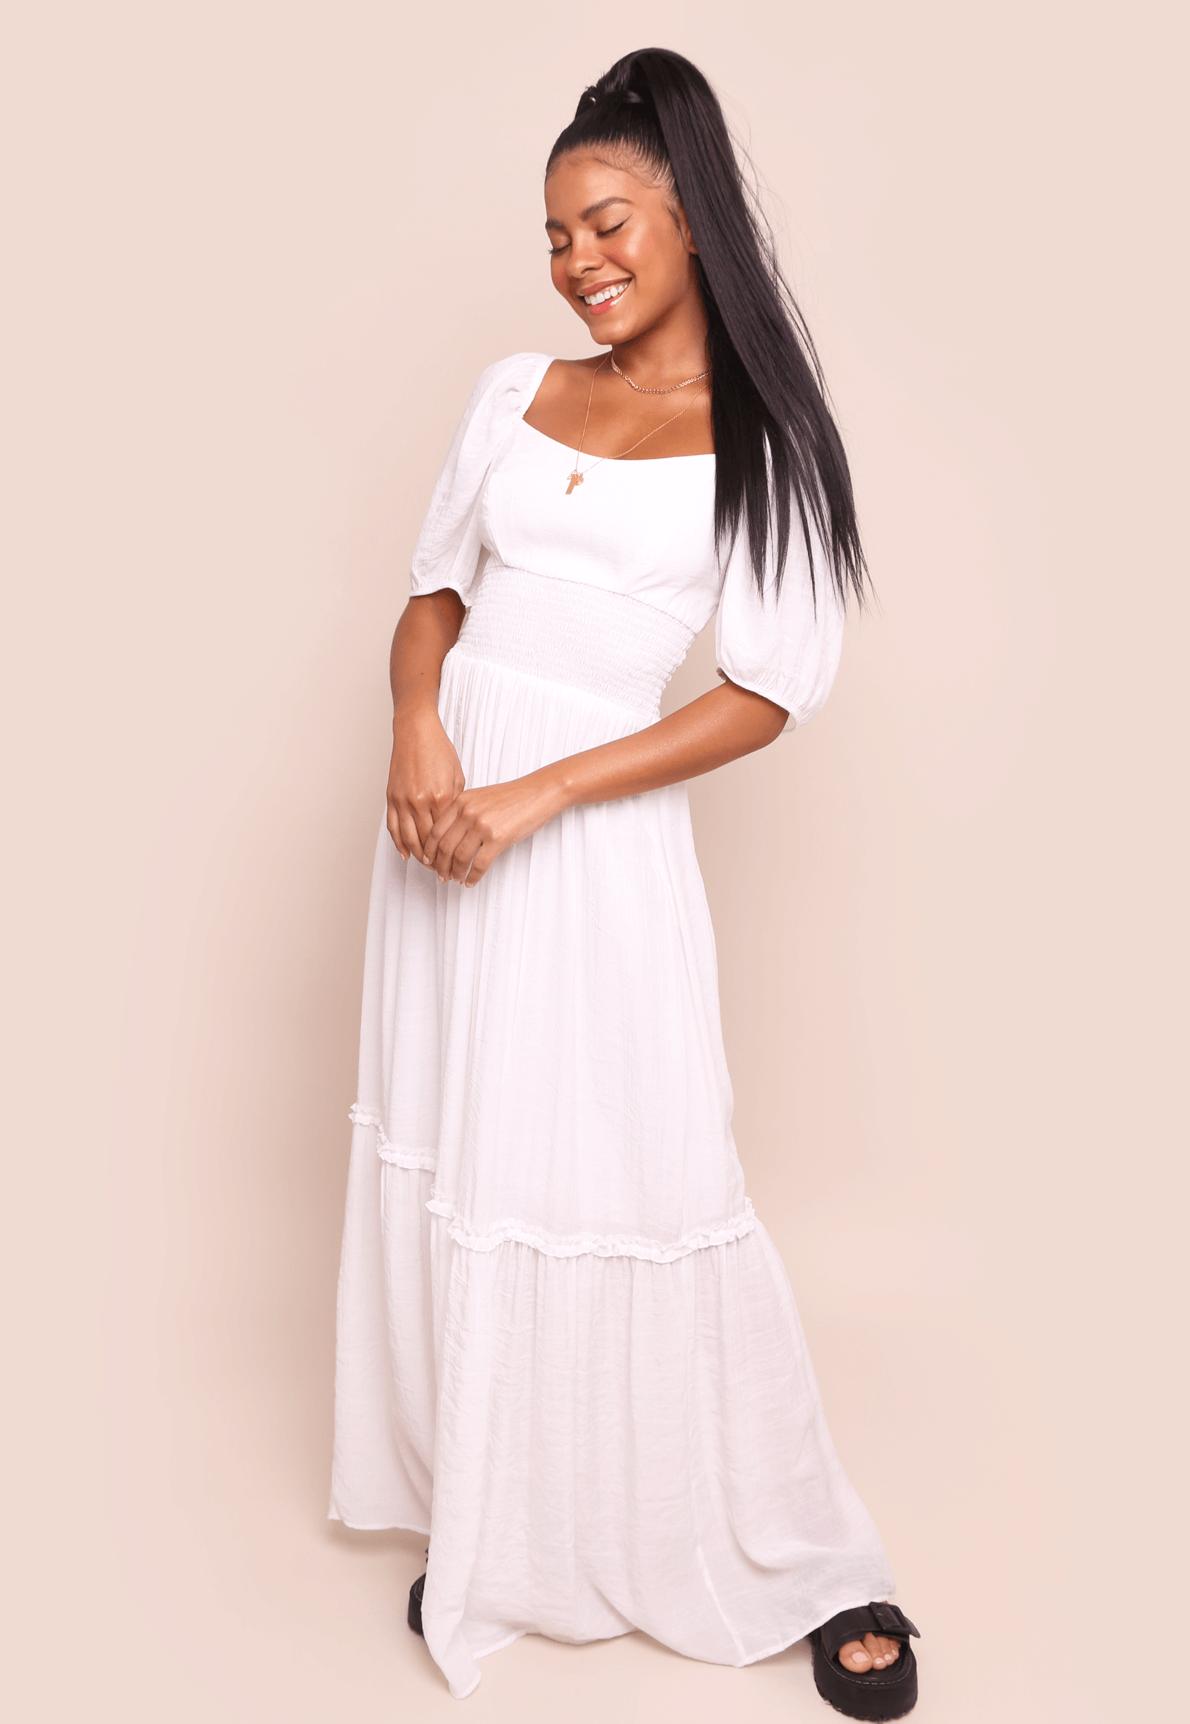 32681-vestido-princesa-off-white-lia-mundo-lolita-03